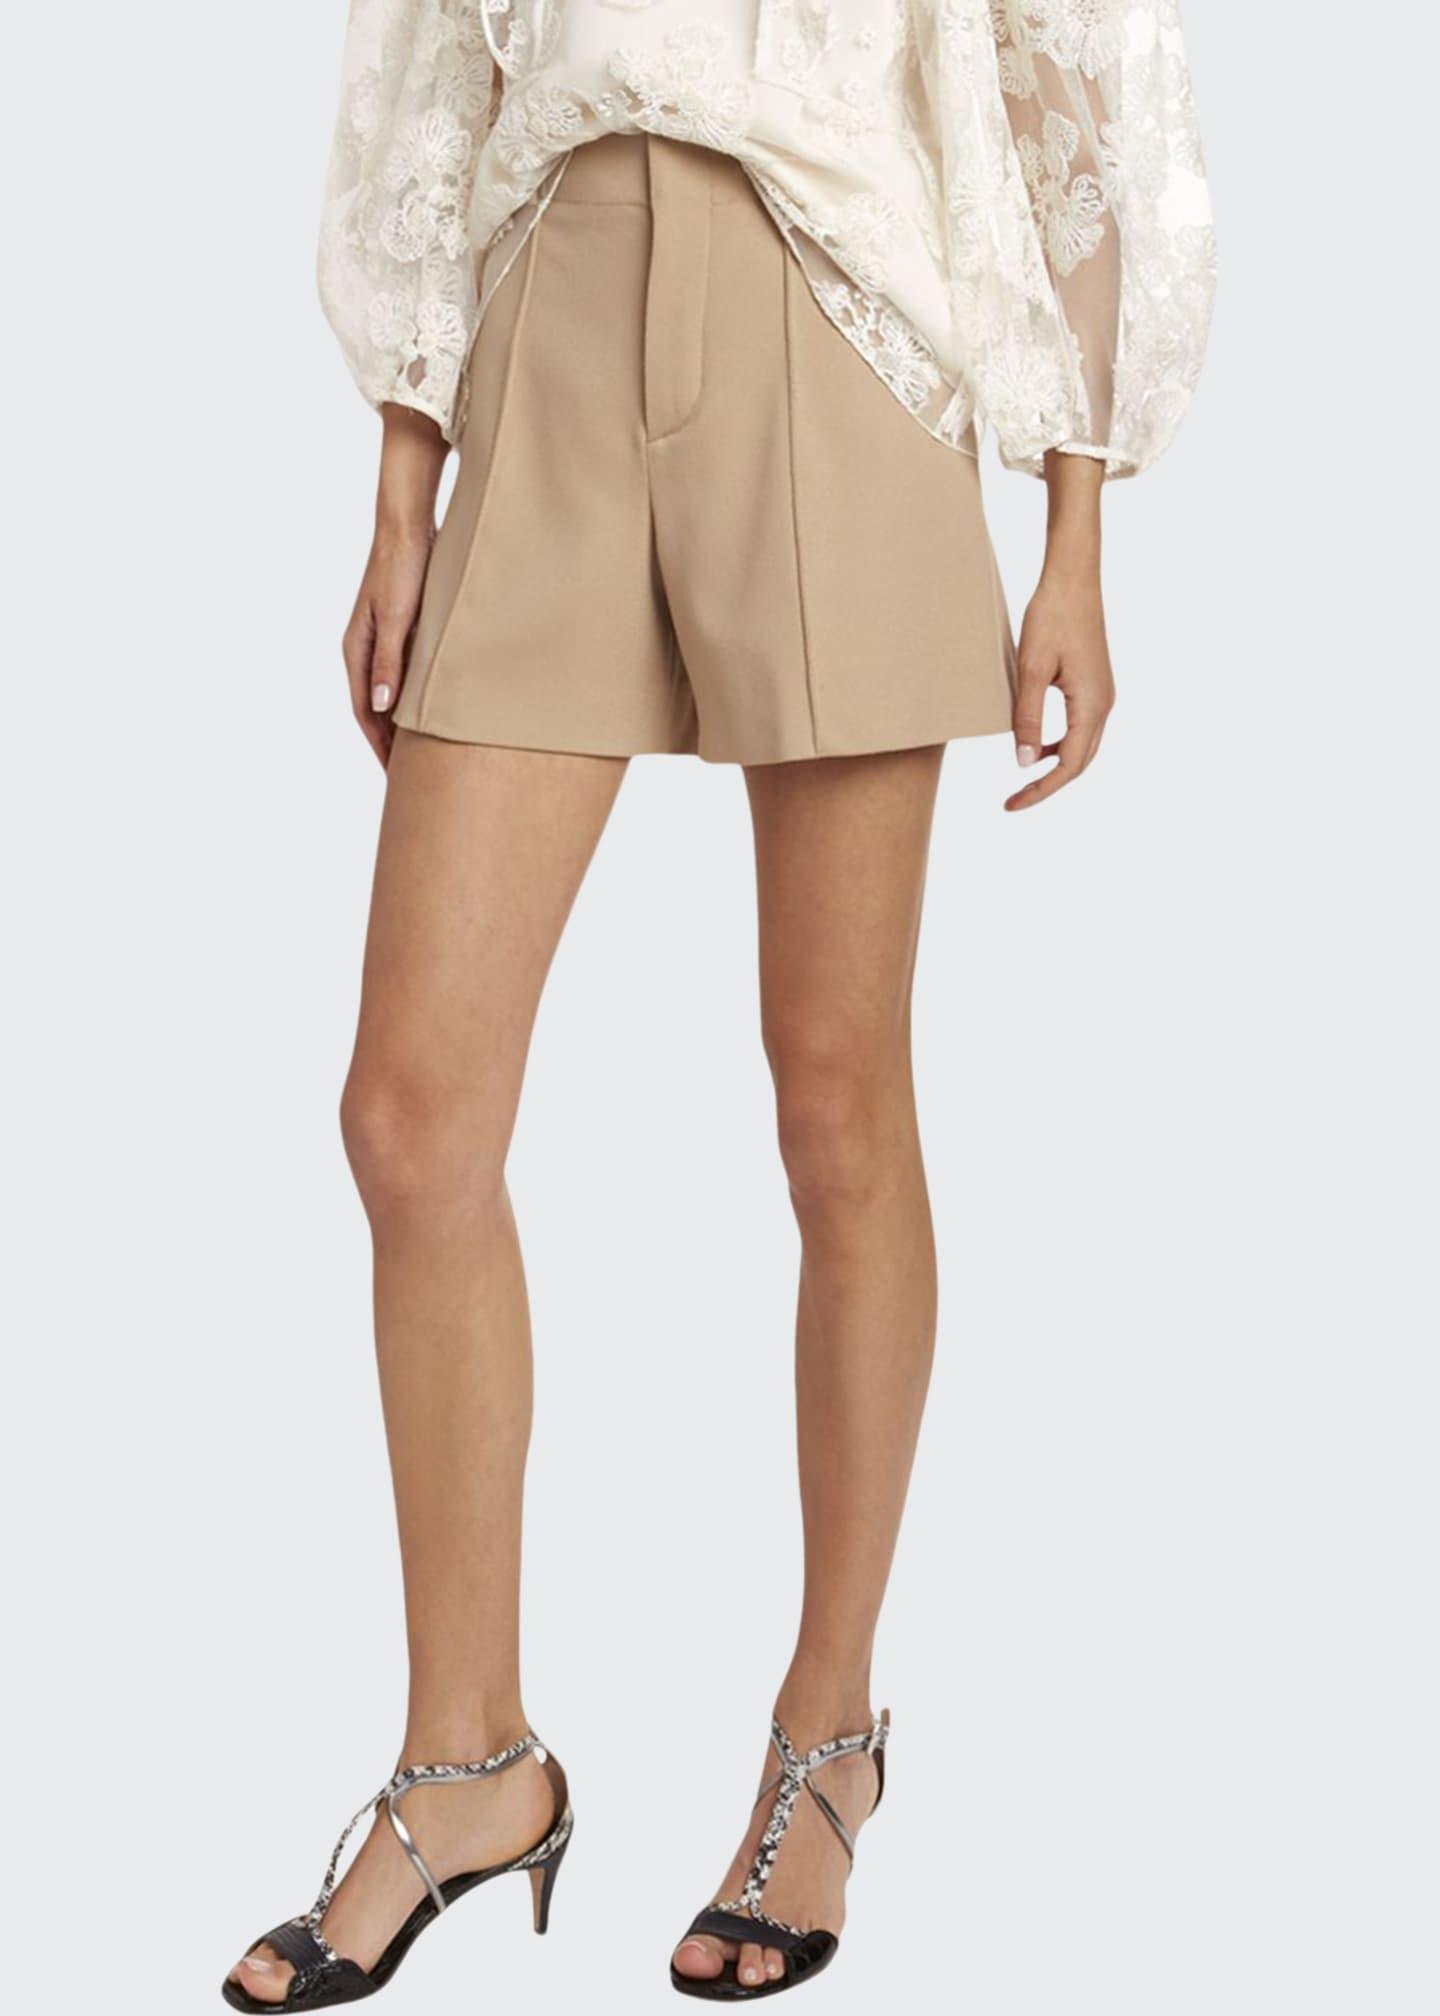 Chloe Wool Crepe Shorts